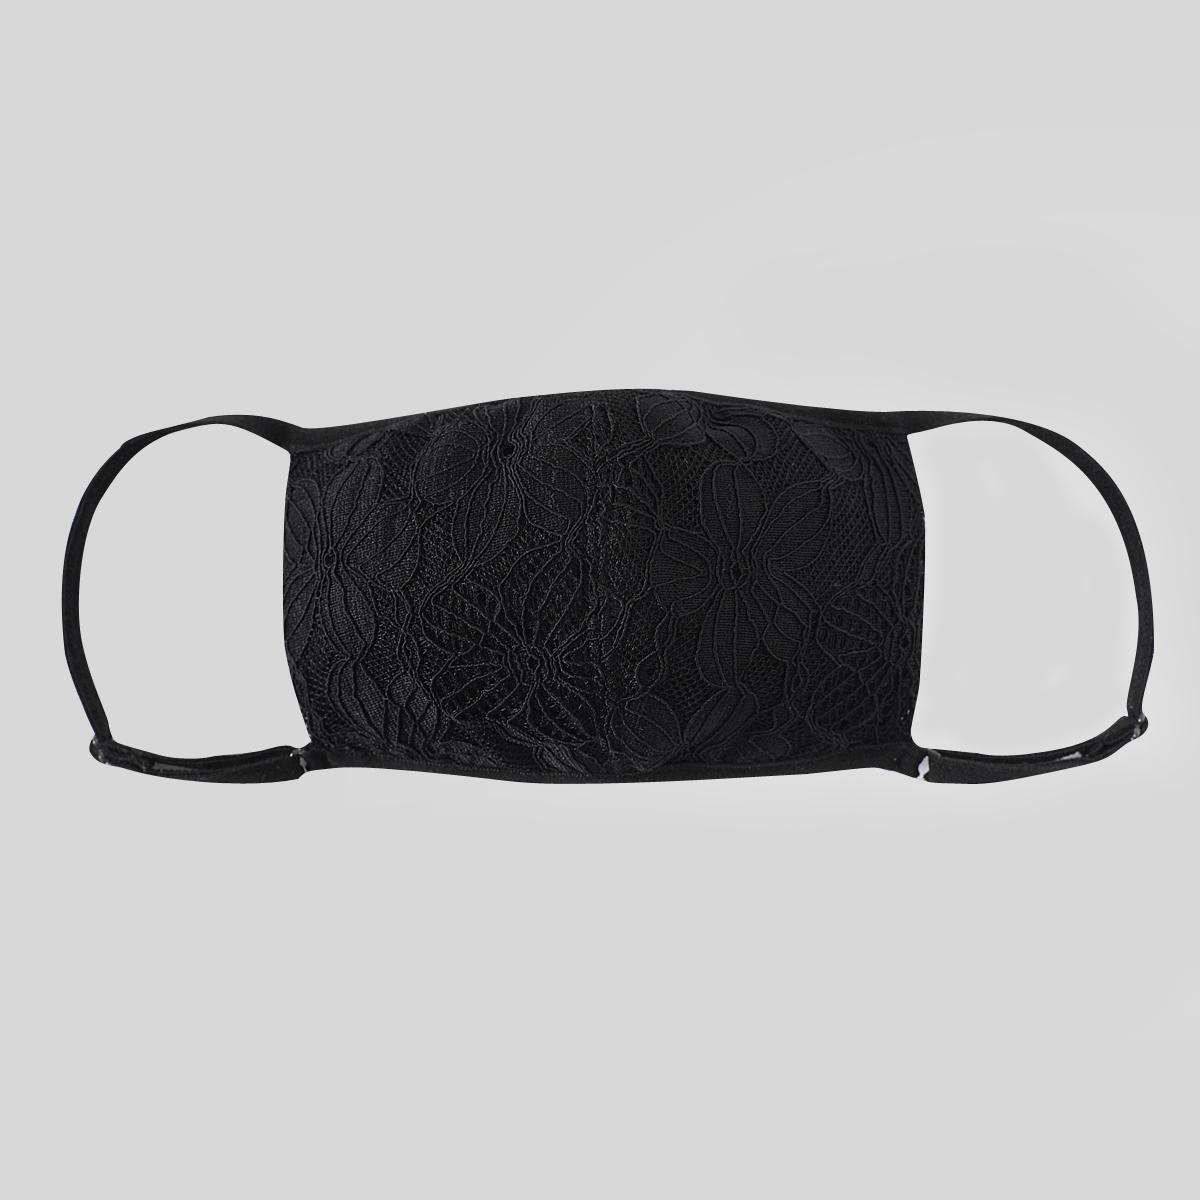 Neo Design Knit Weave Seda Mistura com tecido de renda Máscara facial 4 camadas chiques revestimentos faciais Máscara facial preta e branca